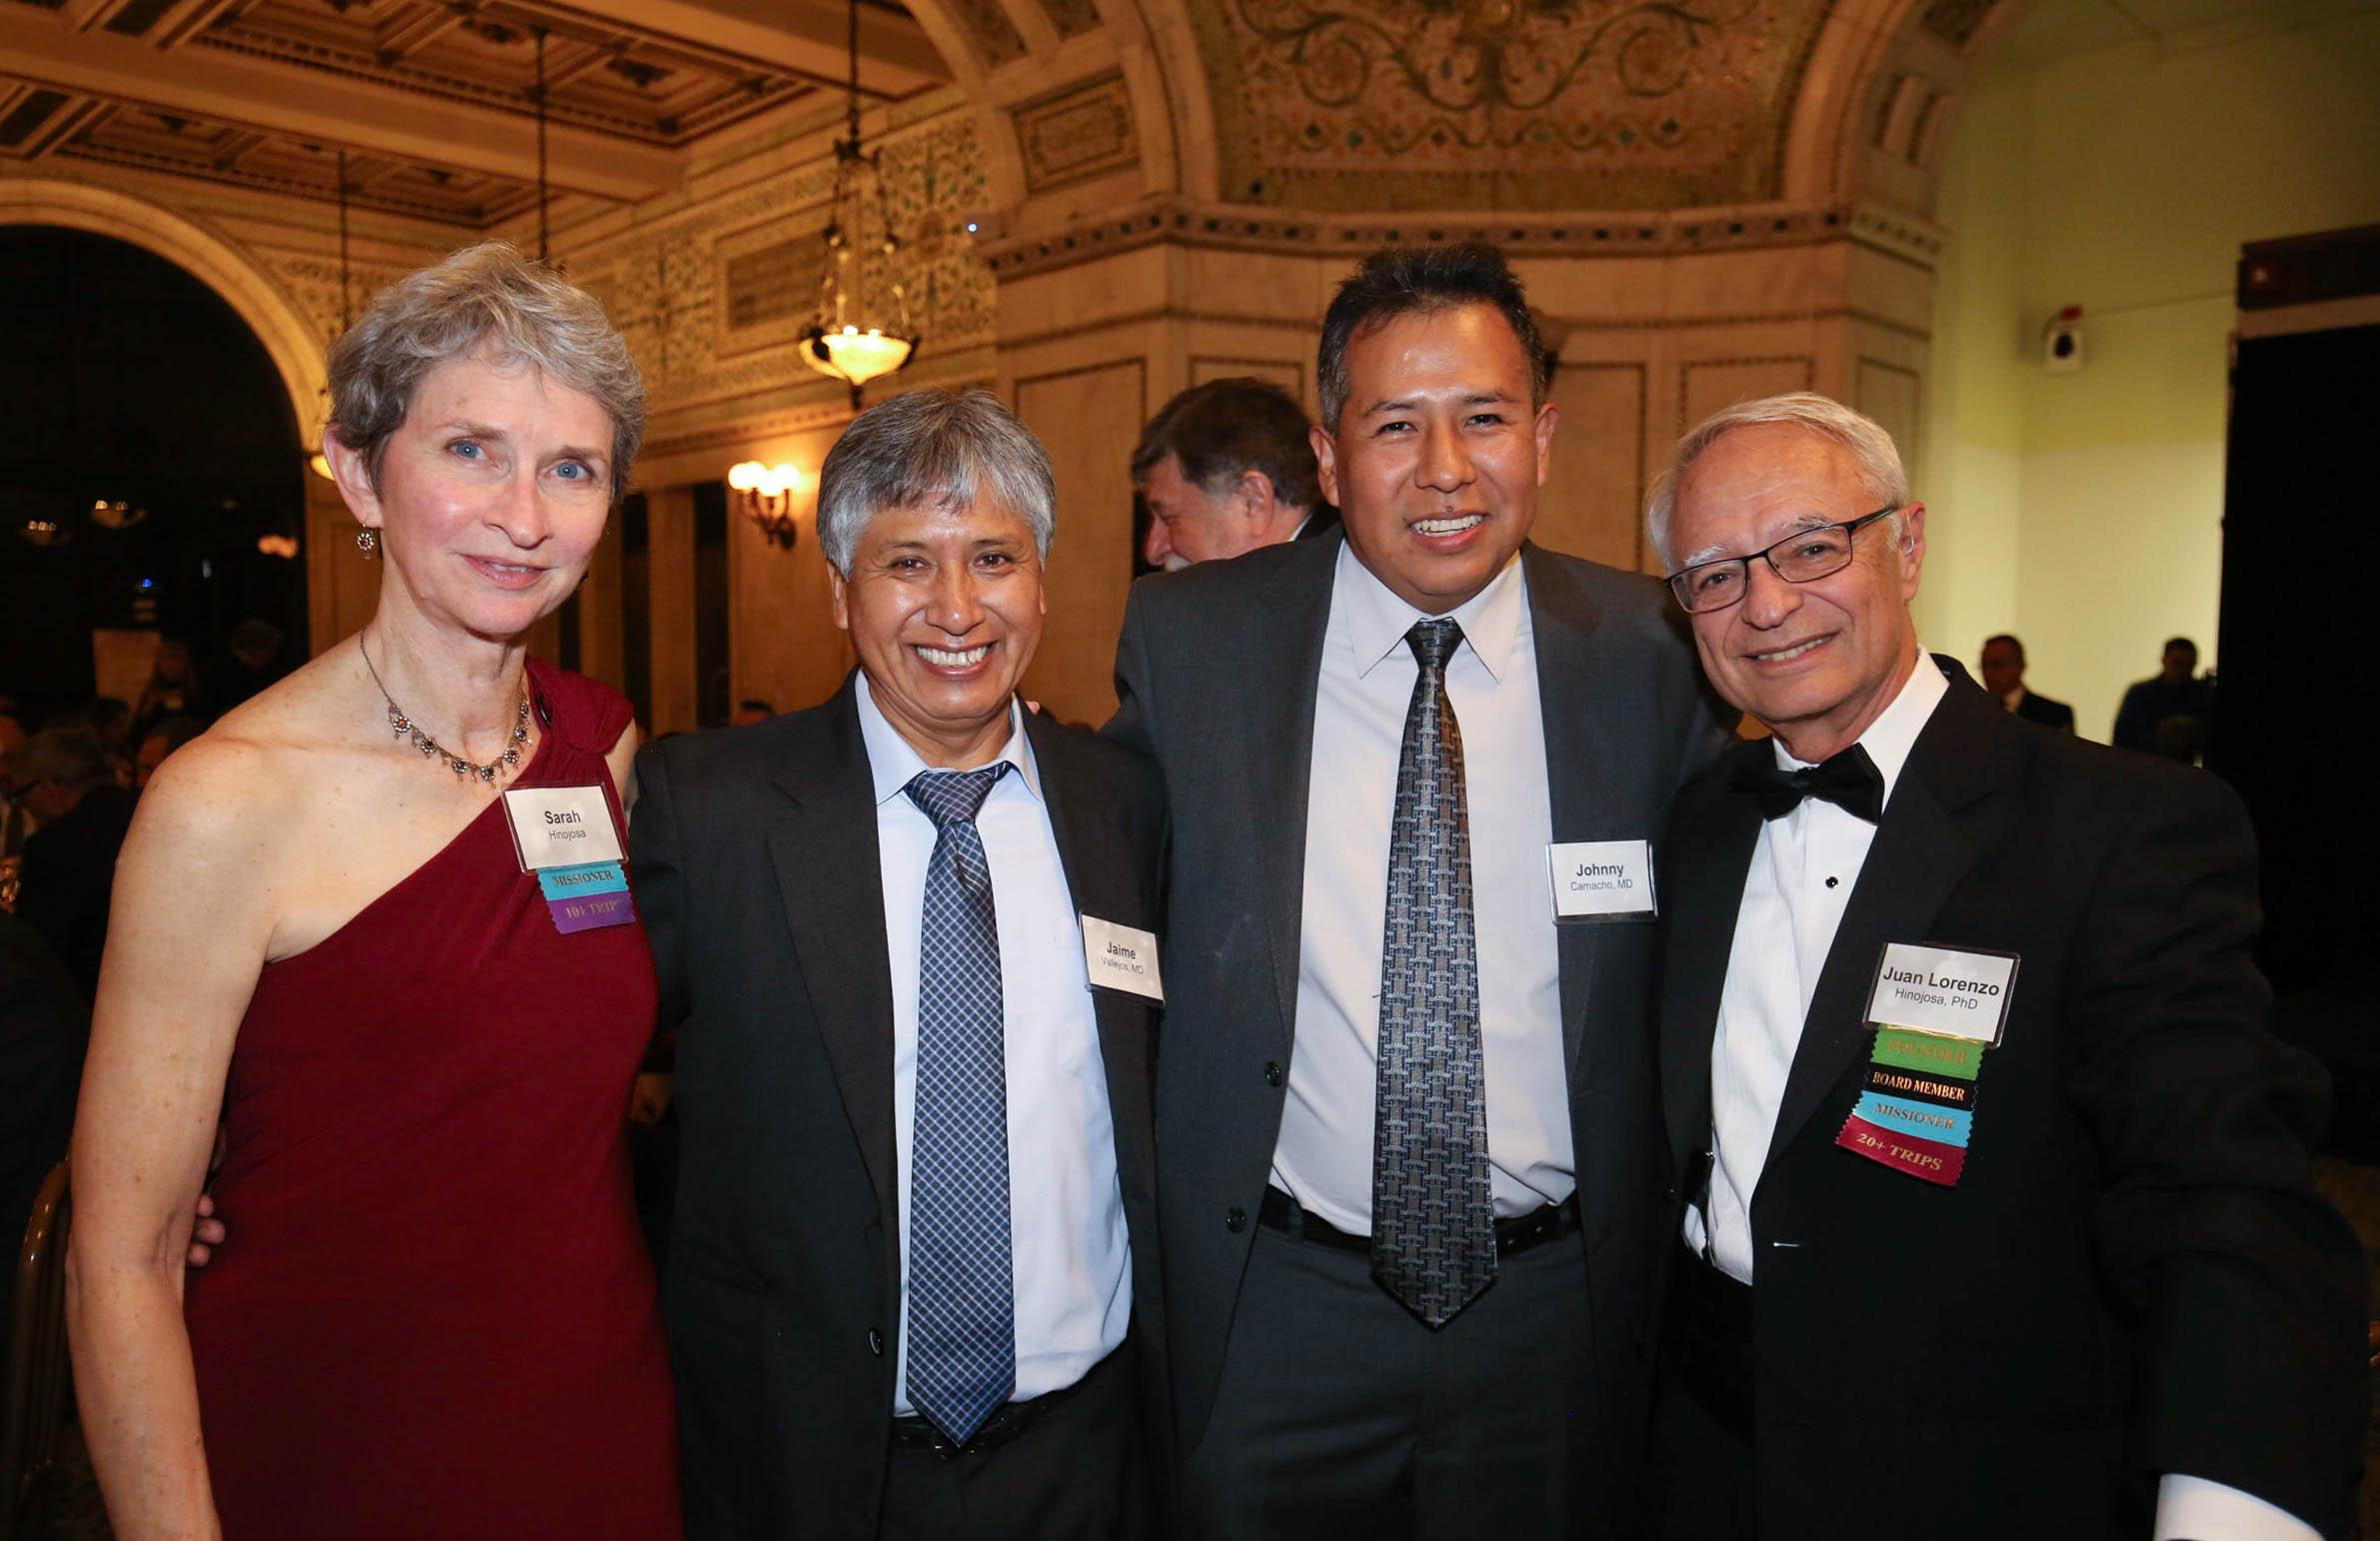 From left: At Fiesta with Sarah Hinojosa, Jaime Vallejos, Johnny Camacho, and SB founder Juan Lorenzo Hinojosa